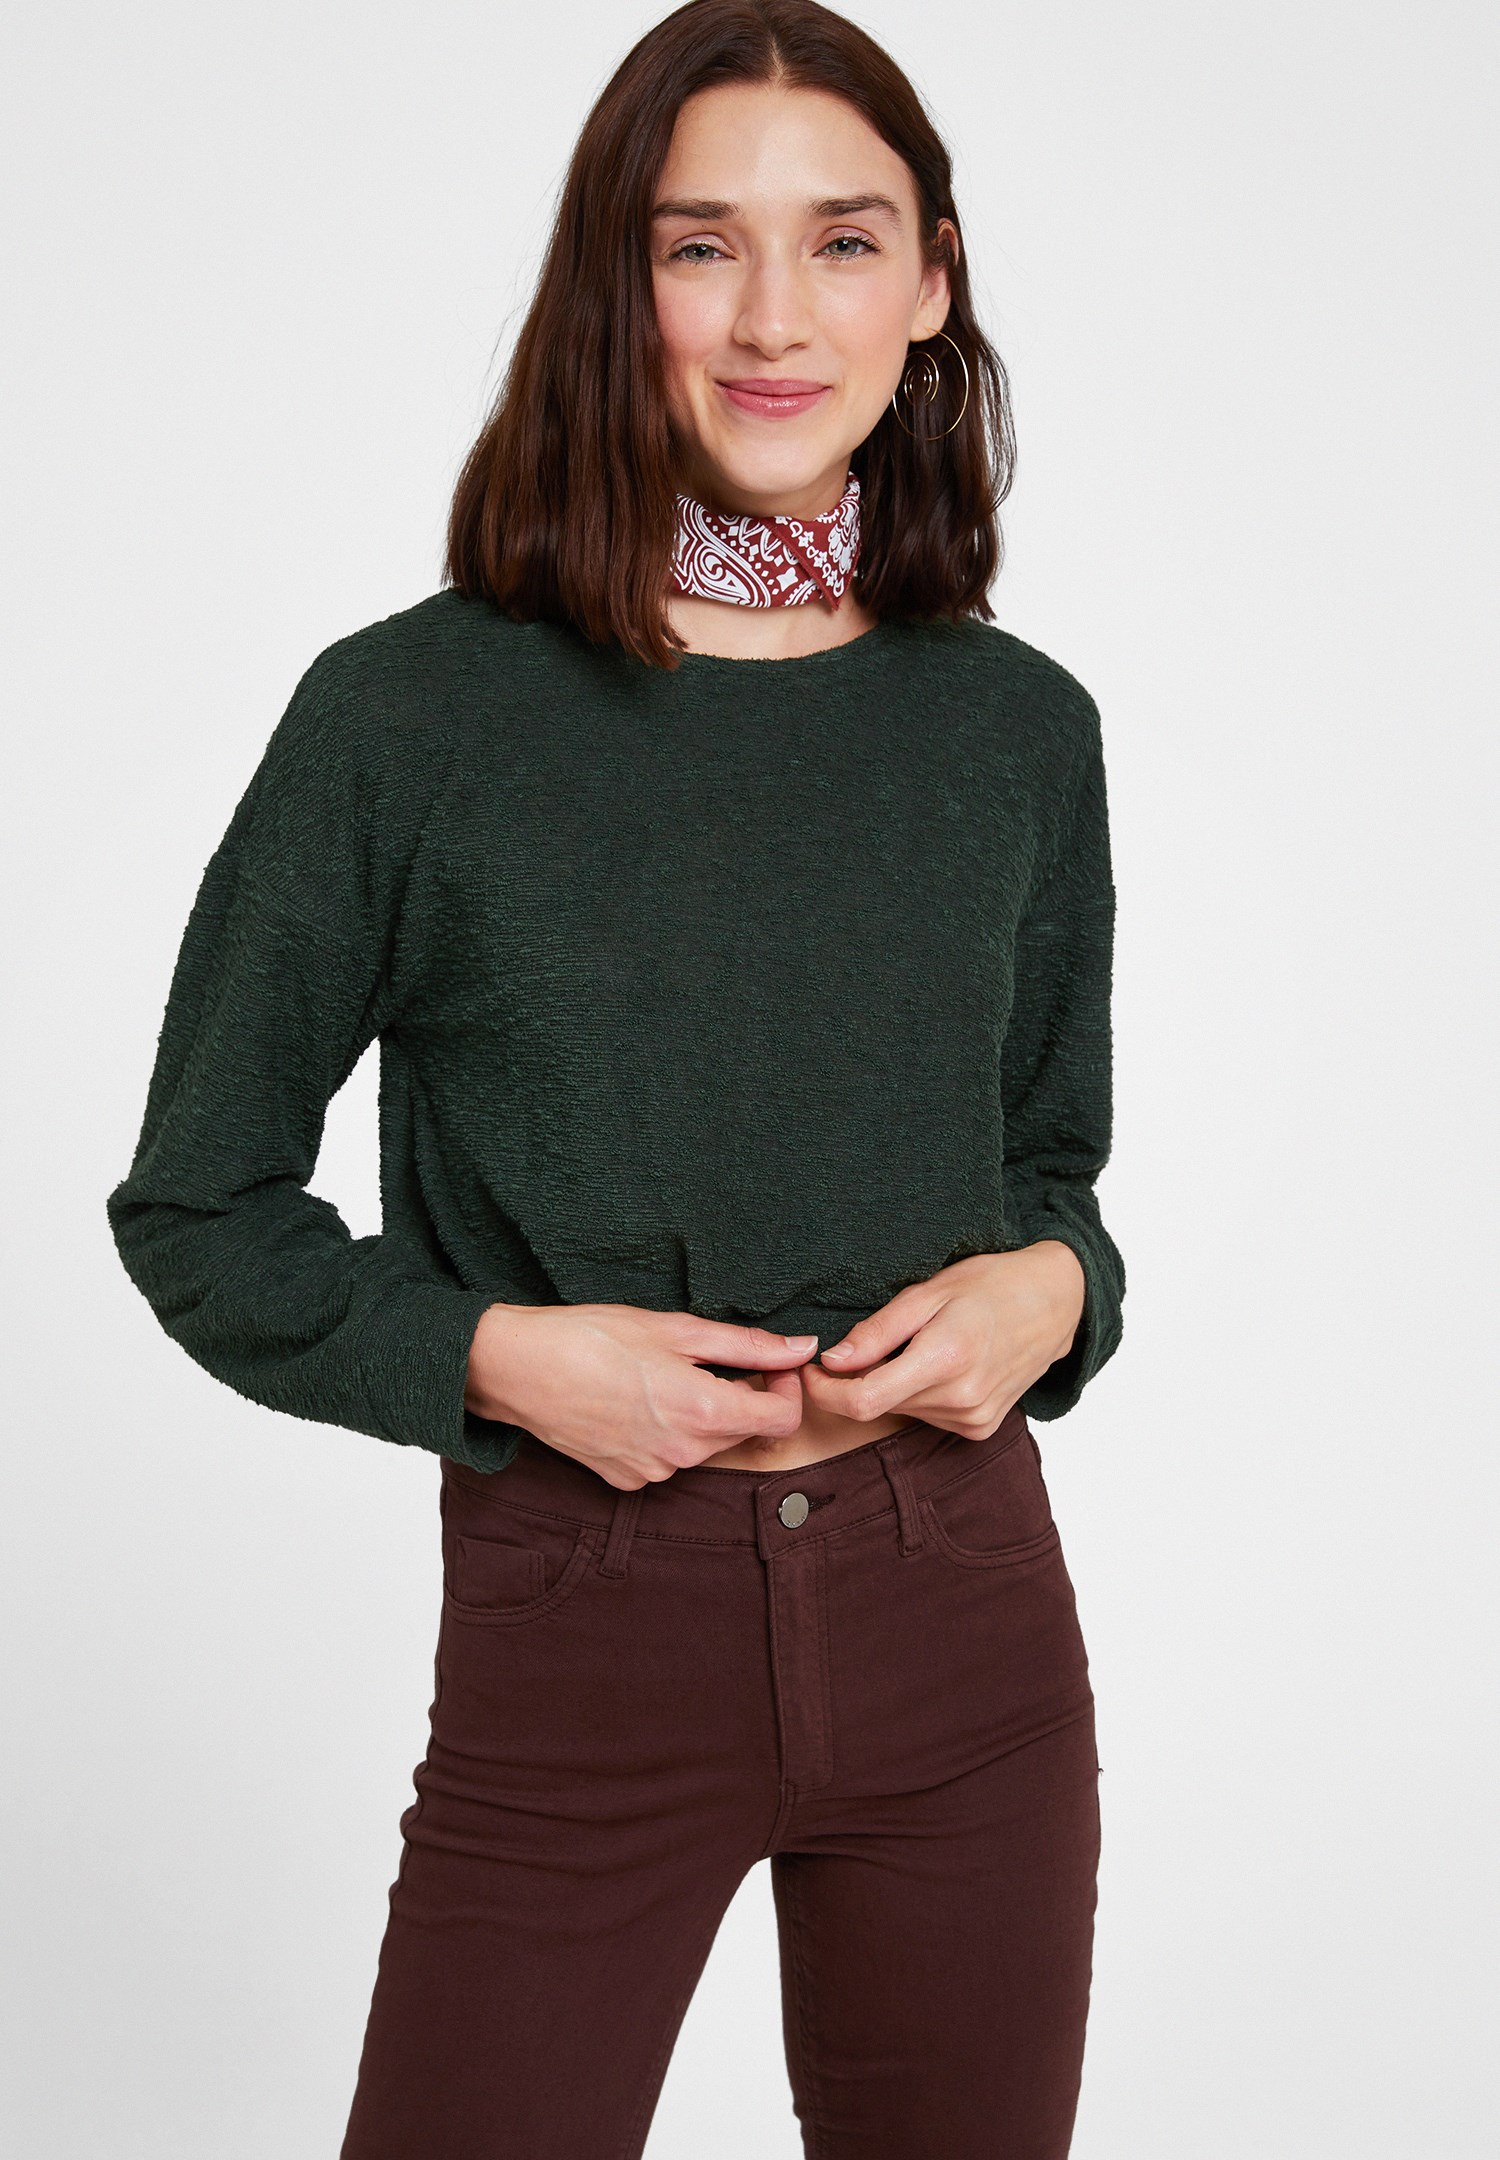 Bayan Yeşil Uzun Kollu Dokulu Triko